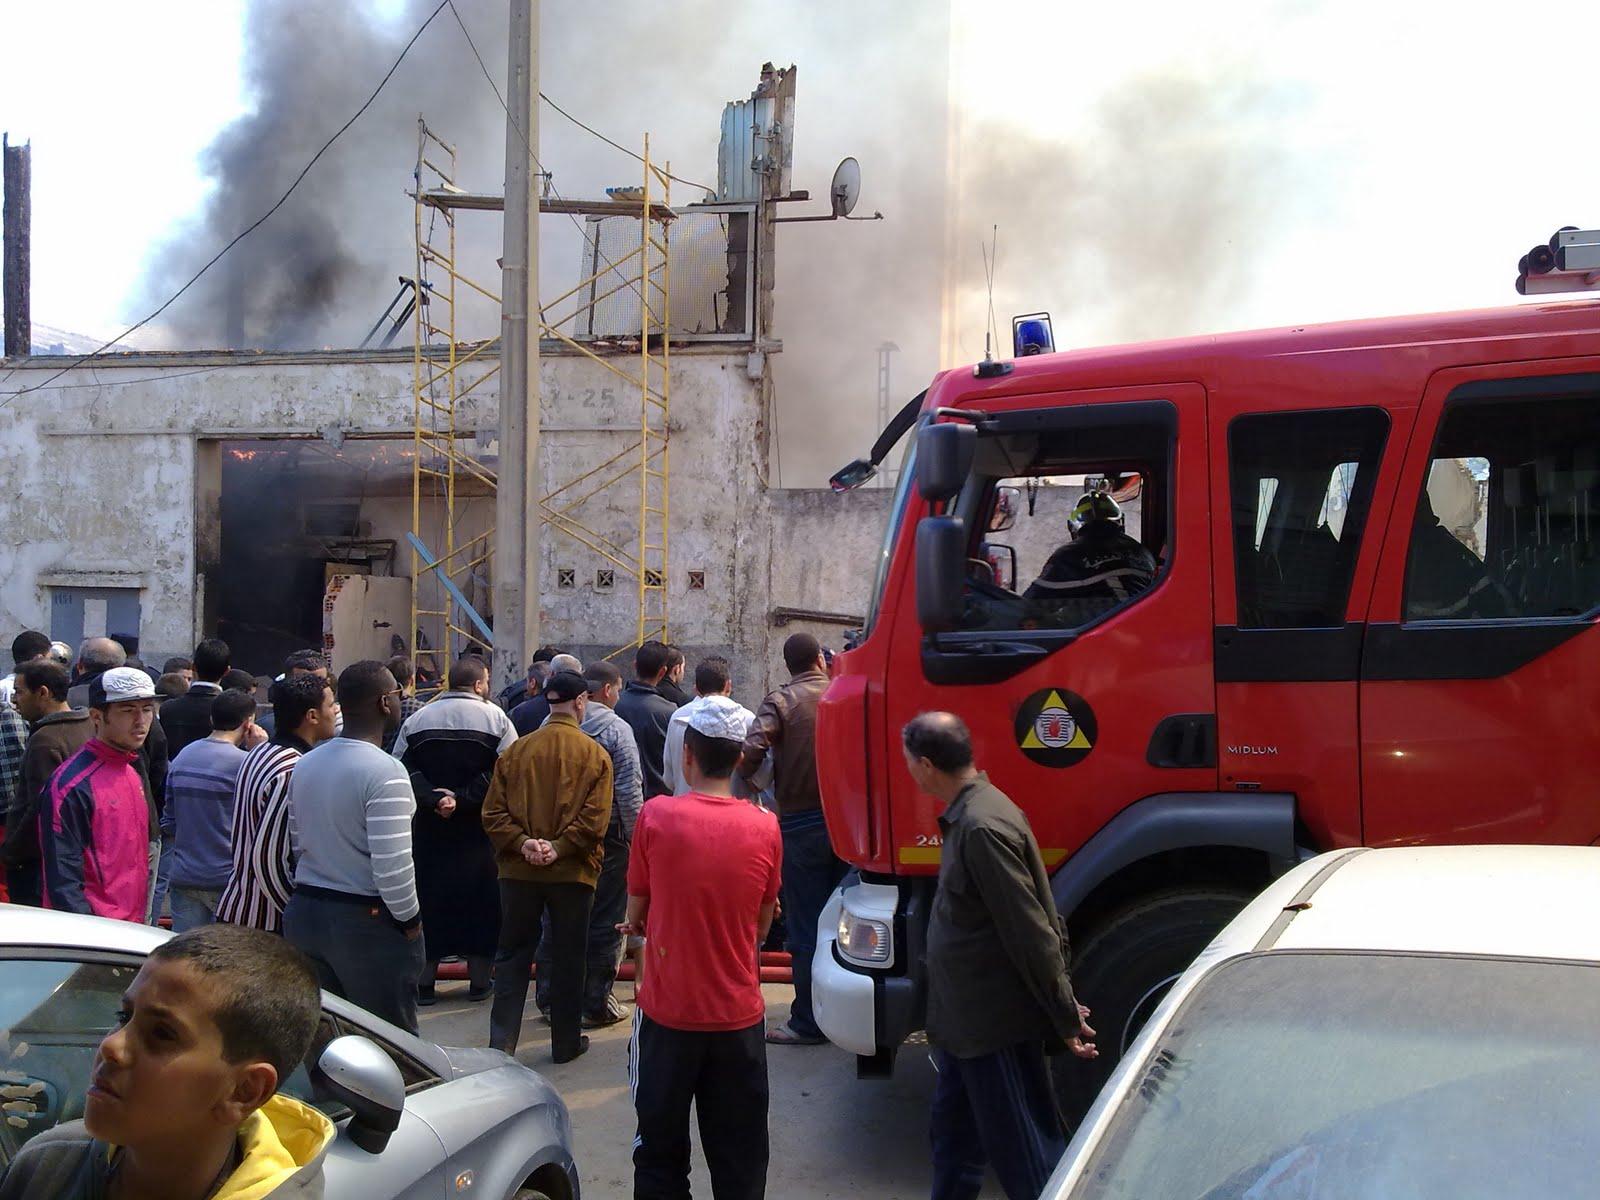 حريق مصنع موبيليا بدمياط والخسائر تصل إلي ١٢ مليون جنيه